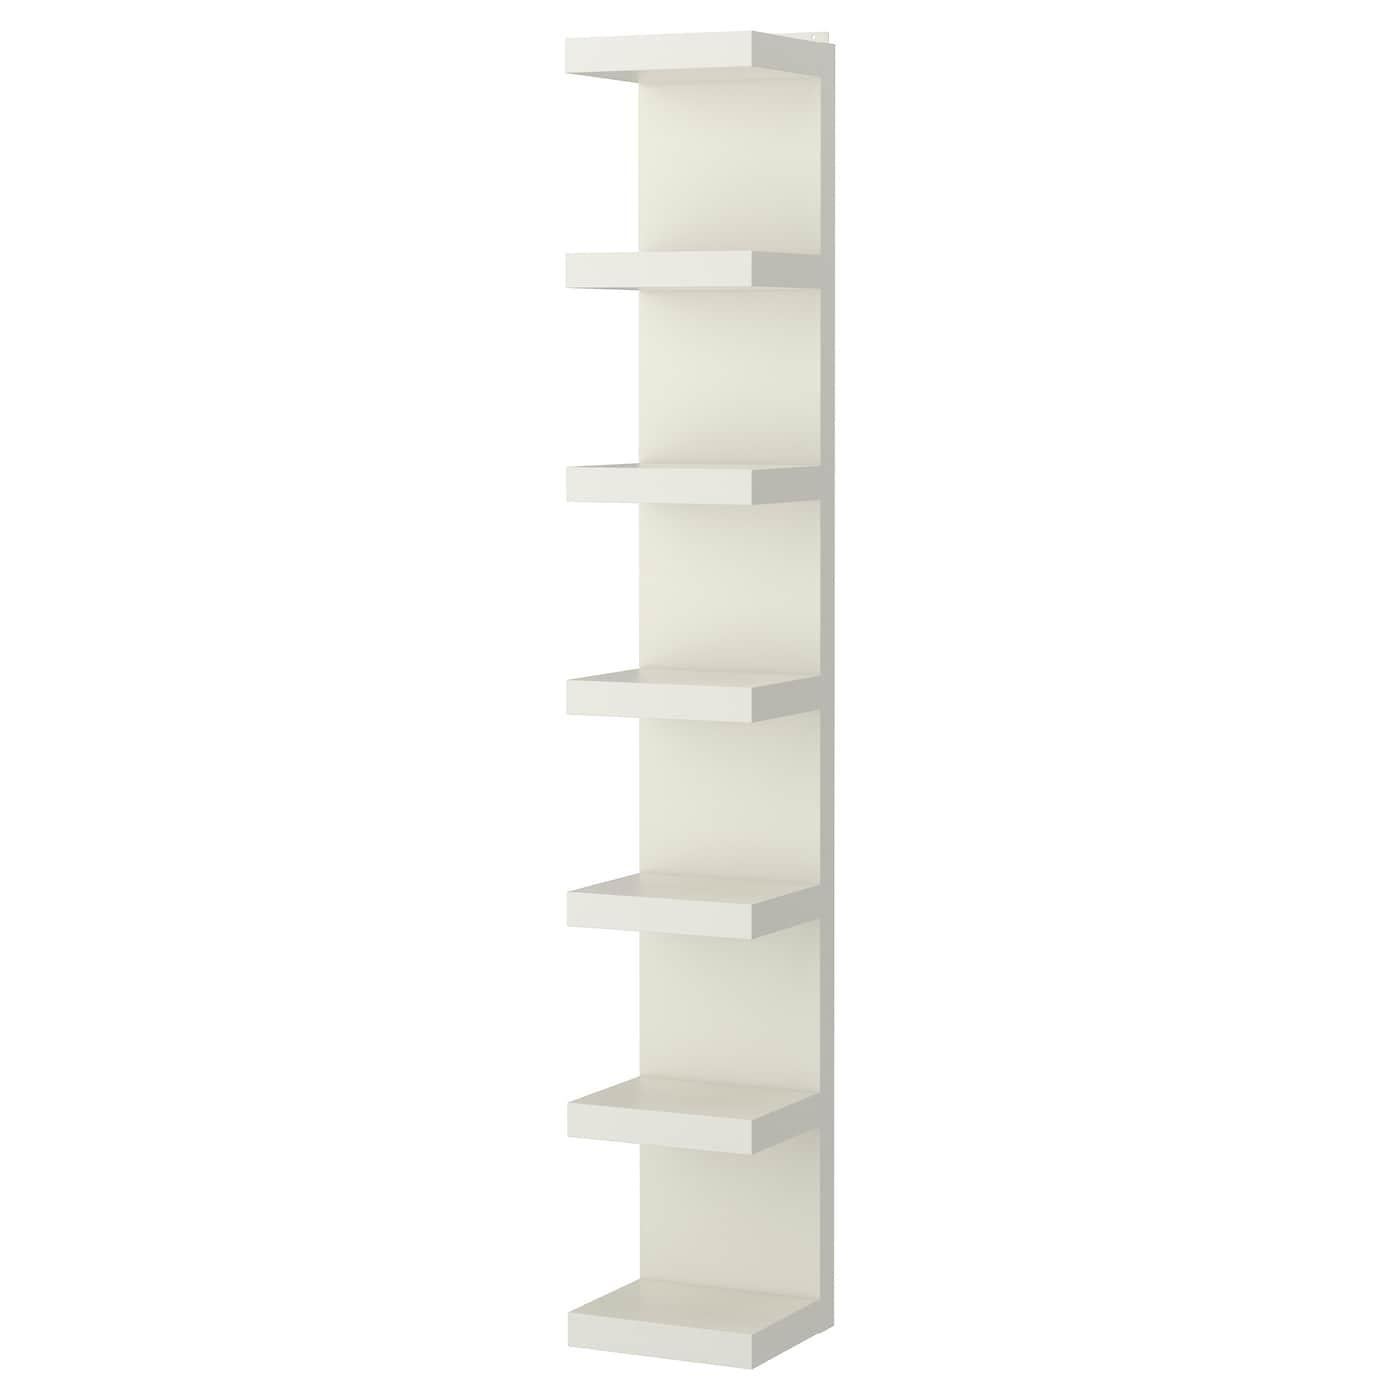 Lack Estanteria De Pared Blanco 30 X 190 Cm Ikea